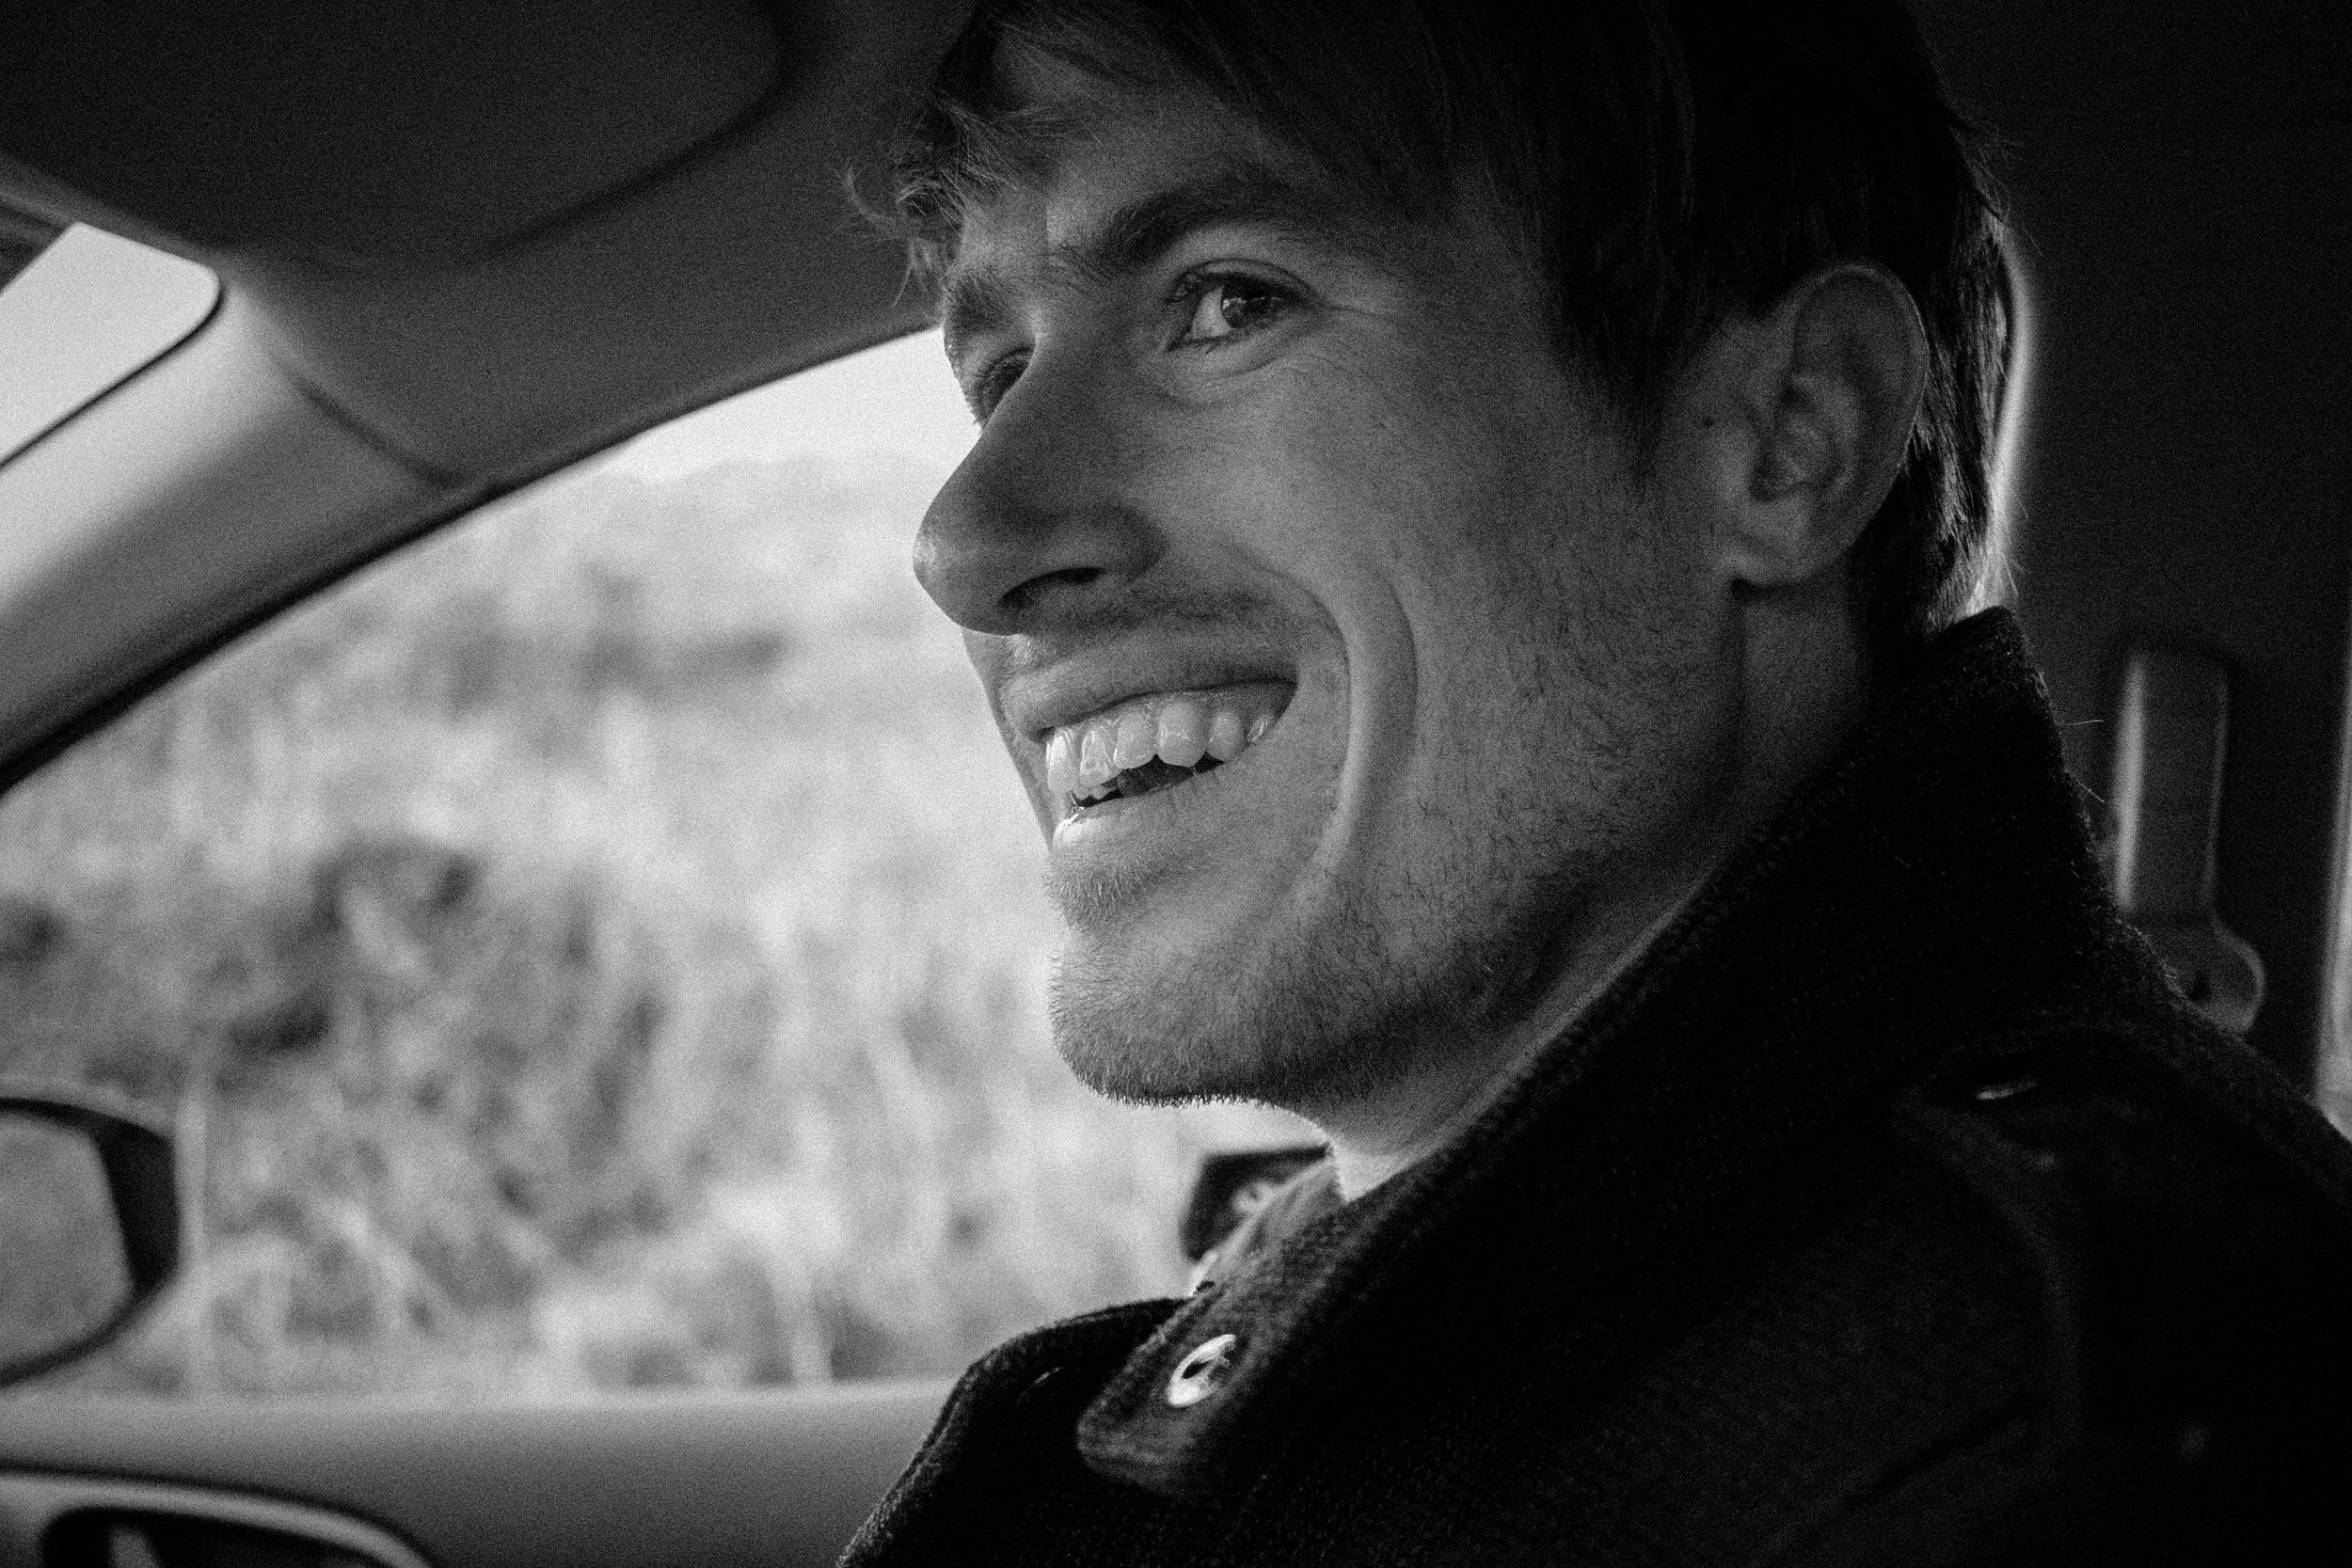 I love his adventure smile